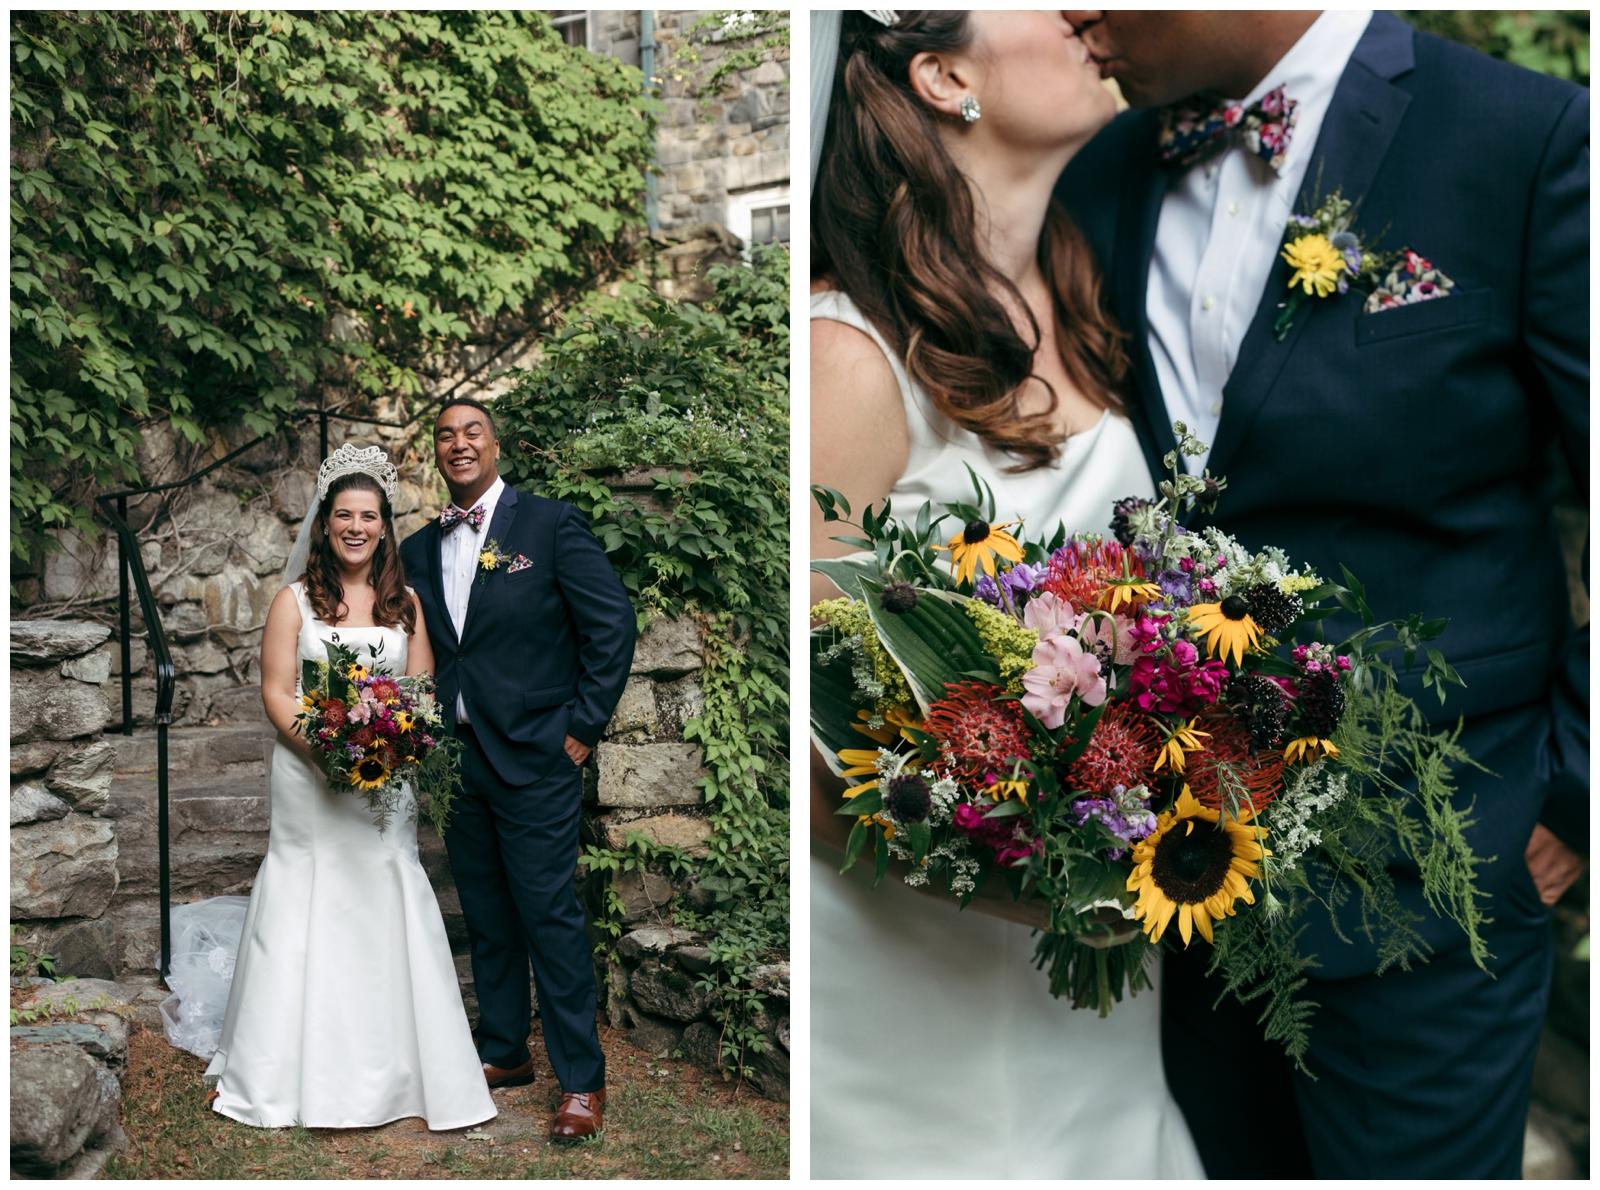 Bailey-Q-Photo-Connors-Center-Wedding-Boston-Wedding-Photographer-065.jpg